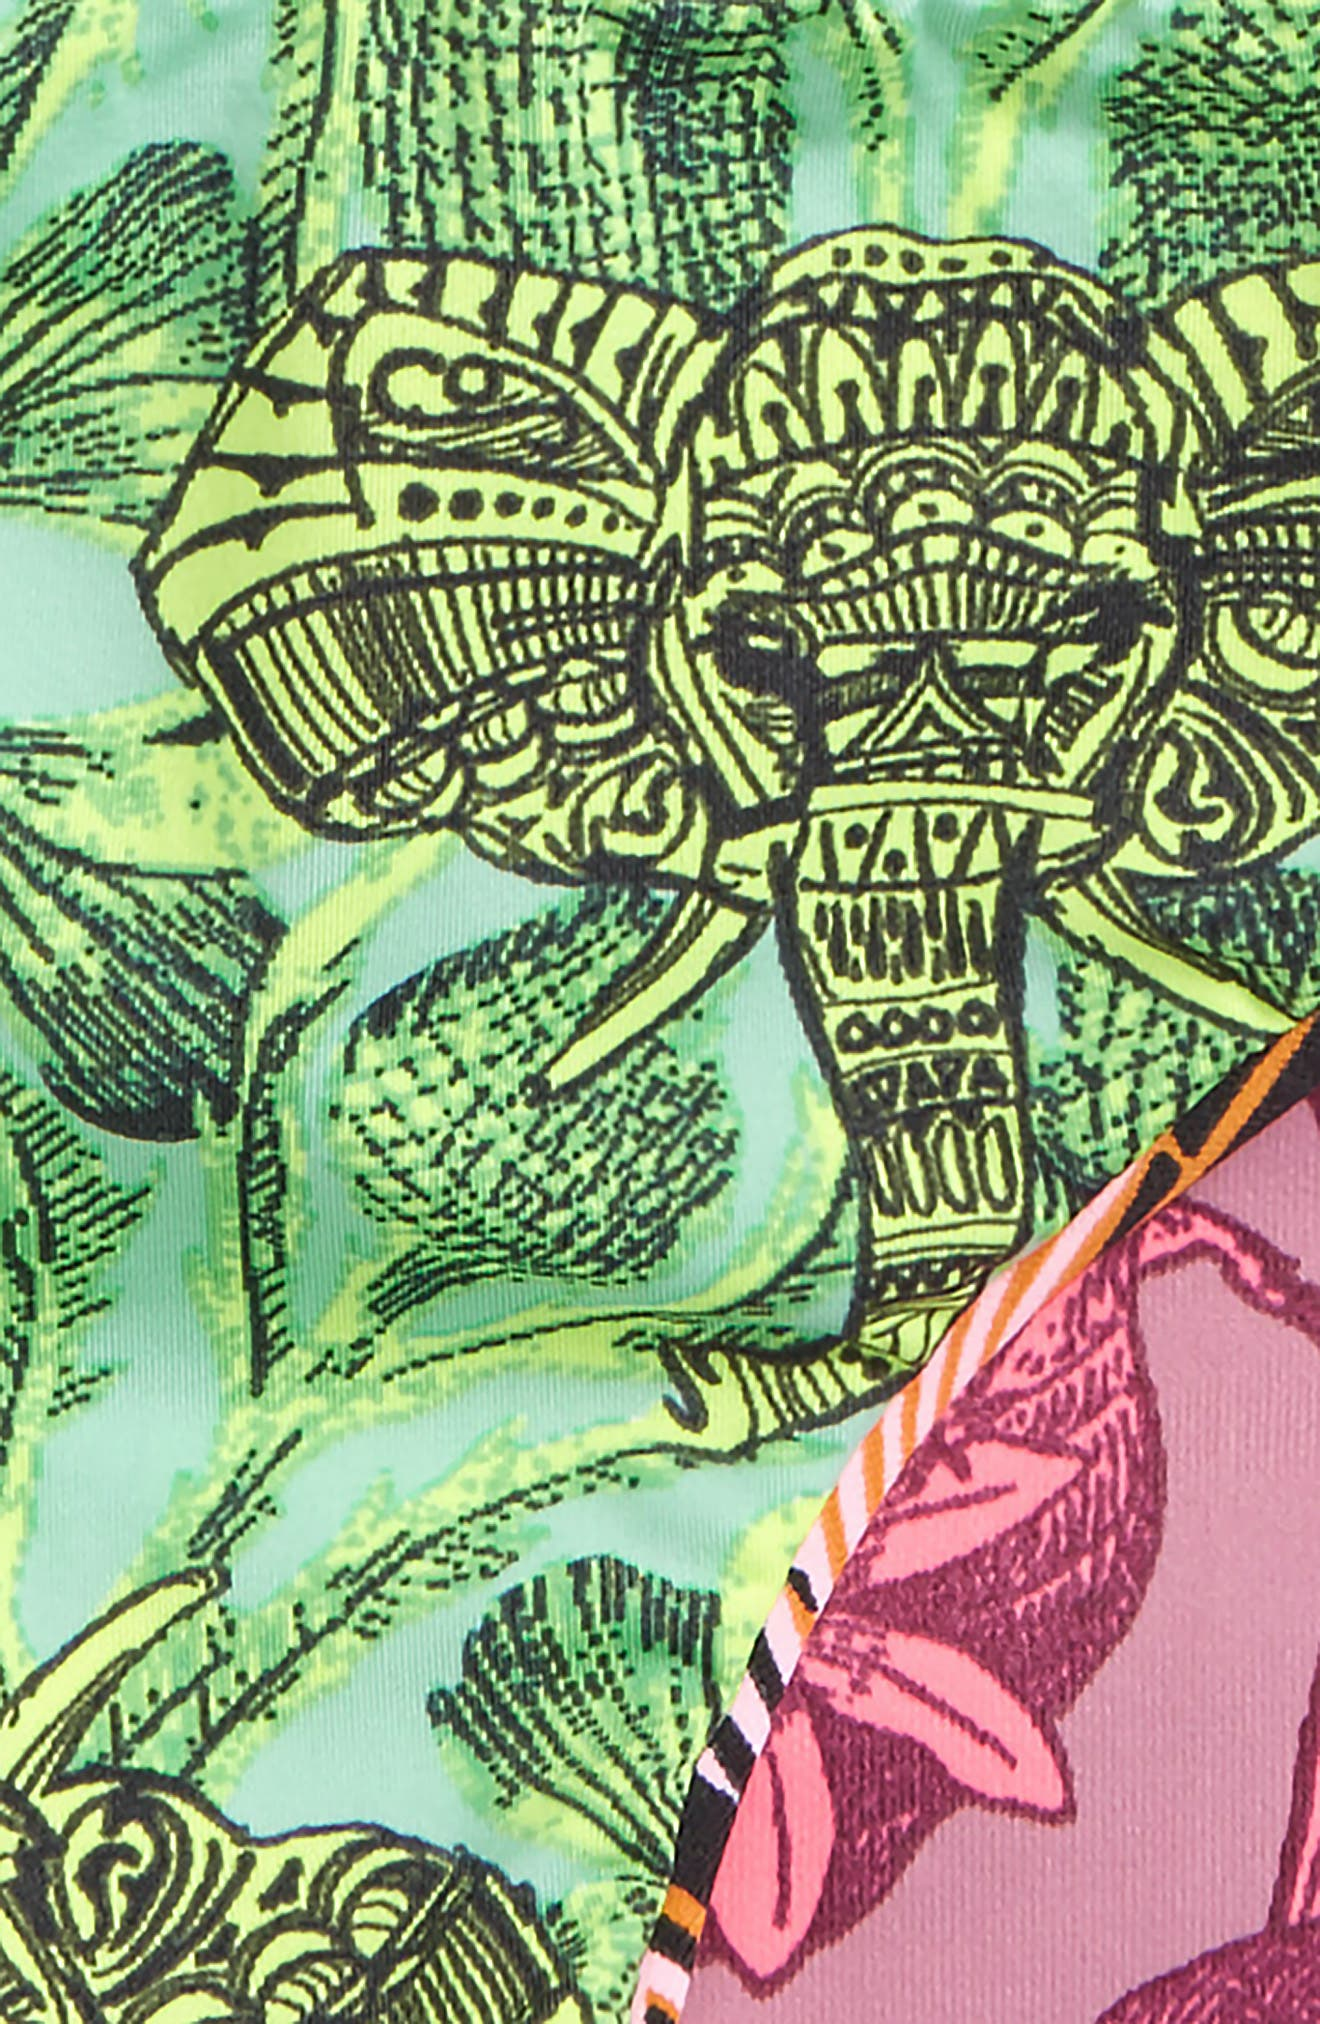 Timia Landscape Reversible Two-Piece Swimsuit,                             Alternate thumbnail 4, color,                             Pink